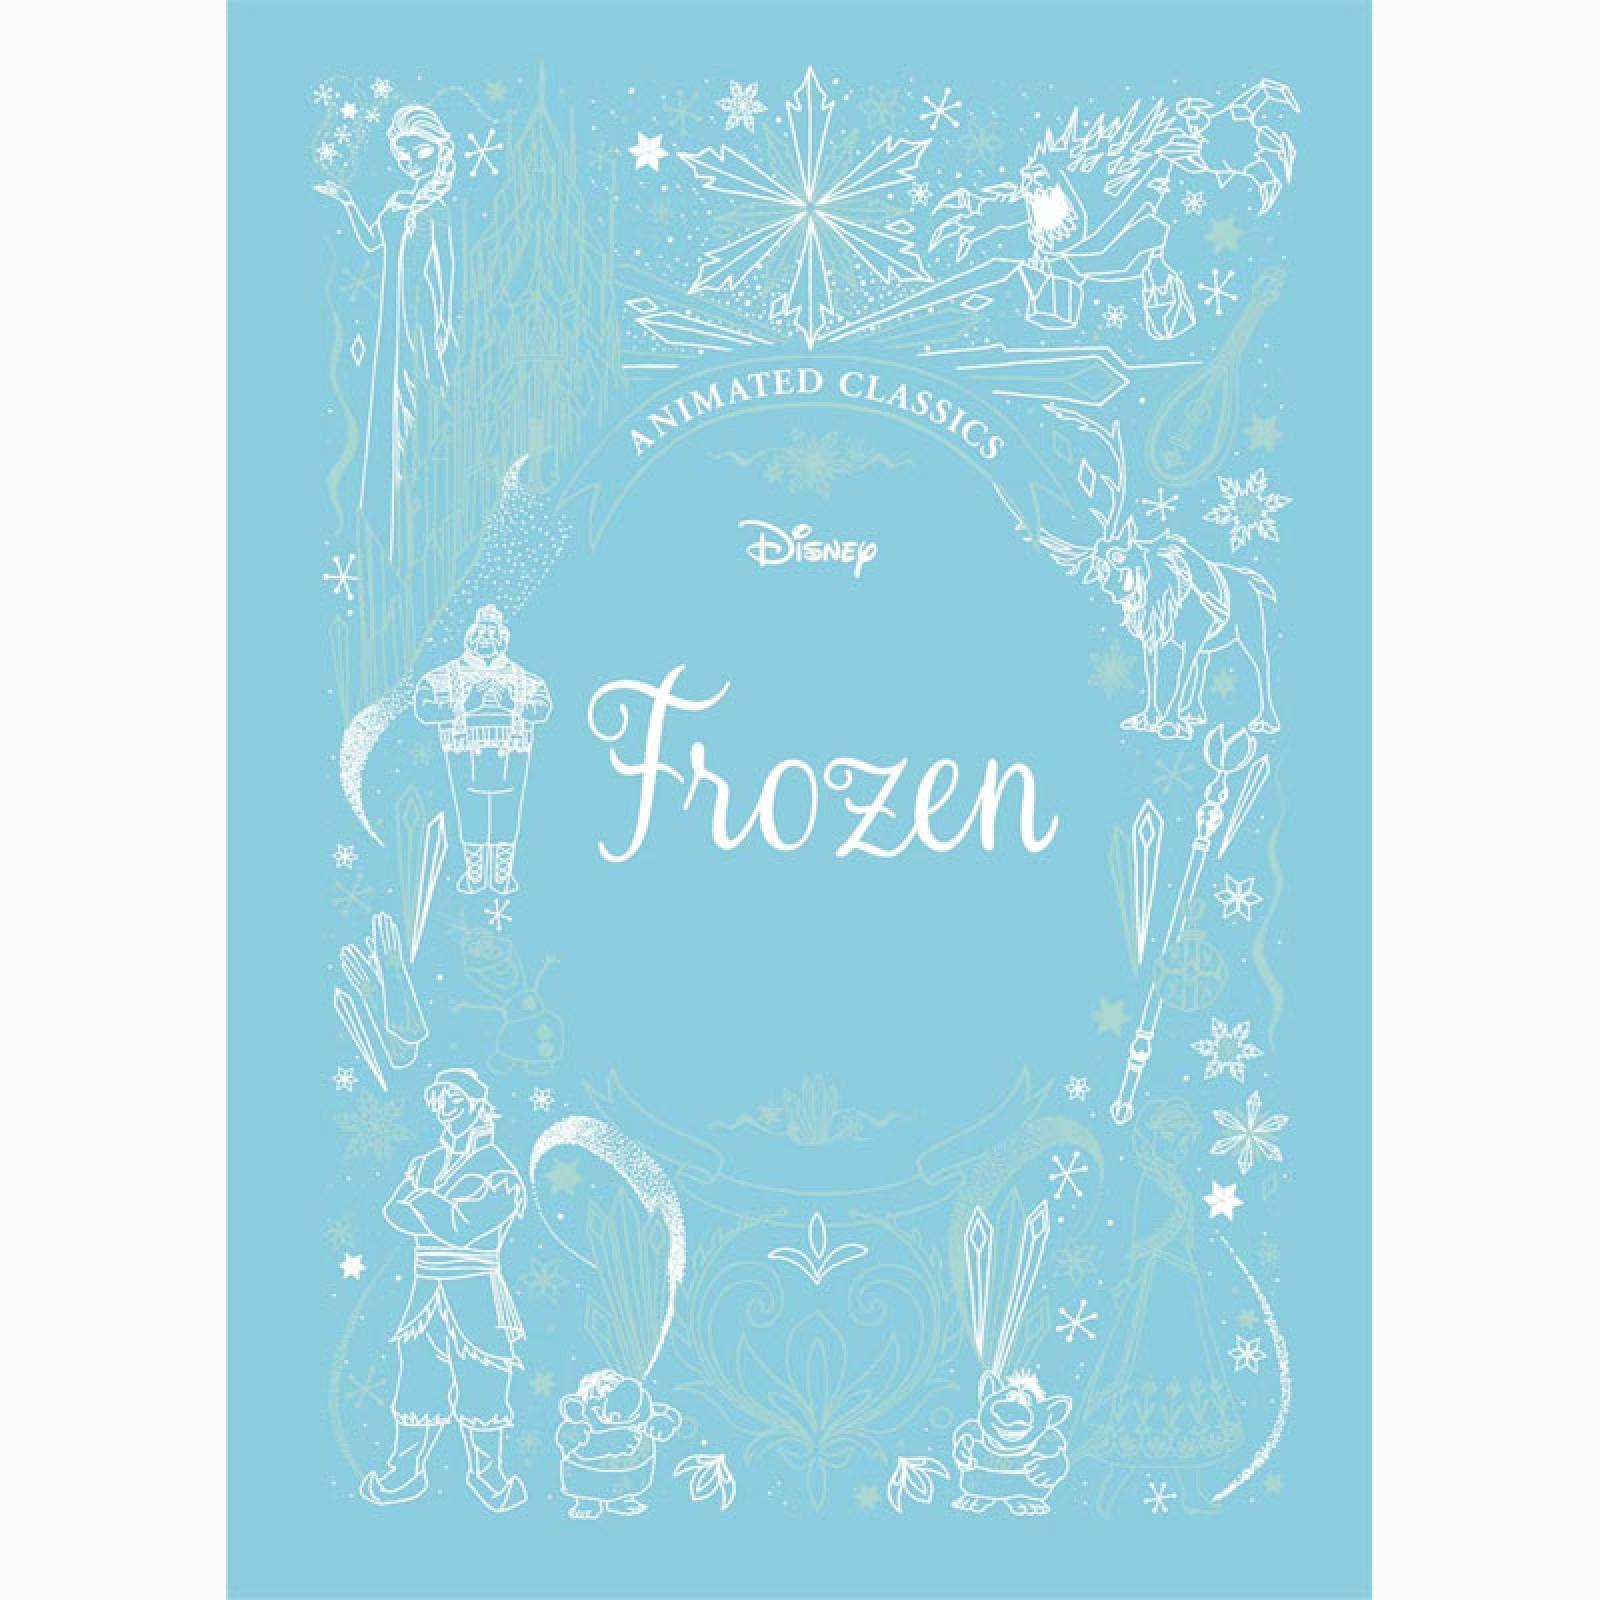 Frozen (Disney Animated Classics) - Hardback Book